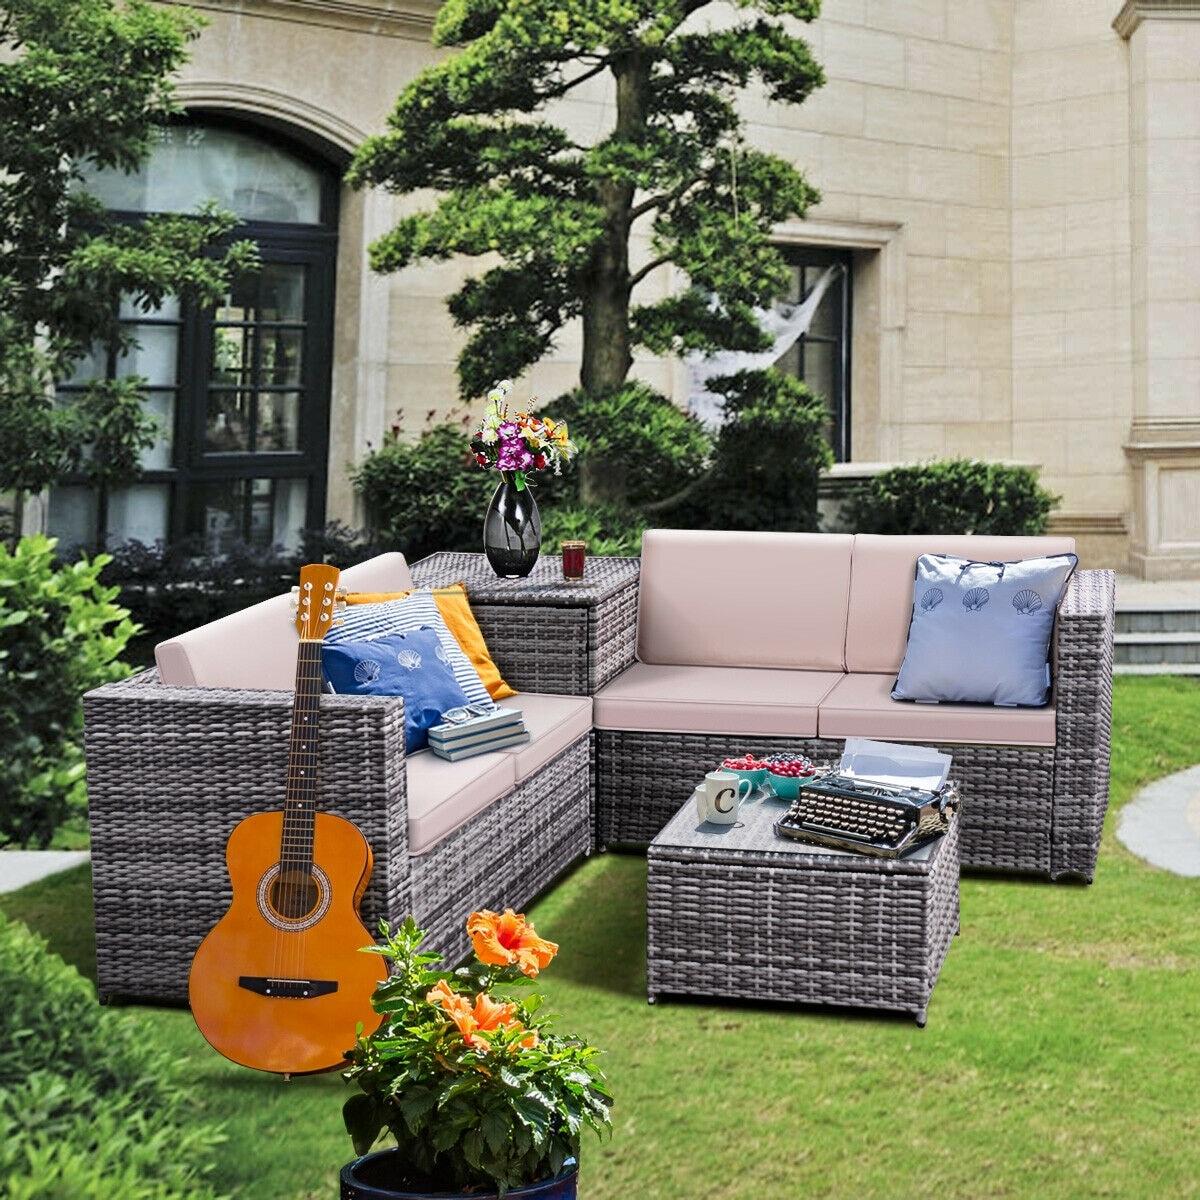 Costway 4pcs Patio Rattan Wicker Furniture Set Sofa Loveseat Cushioned Overstock 16339809